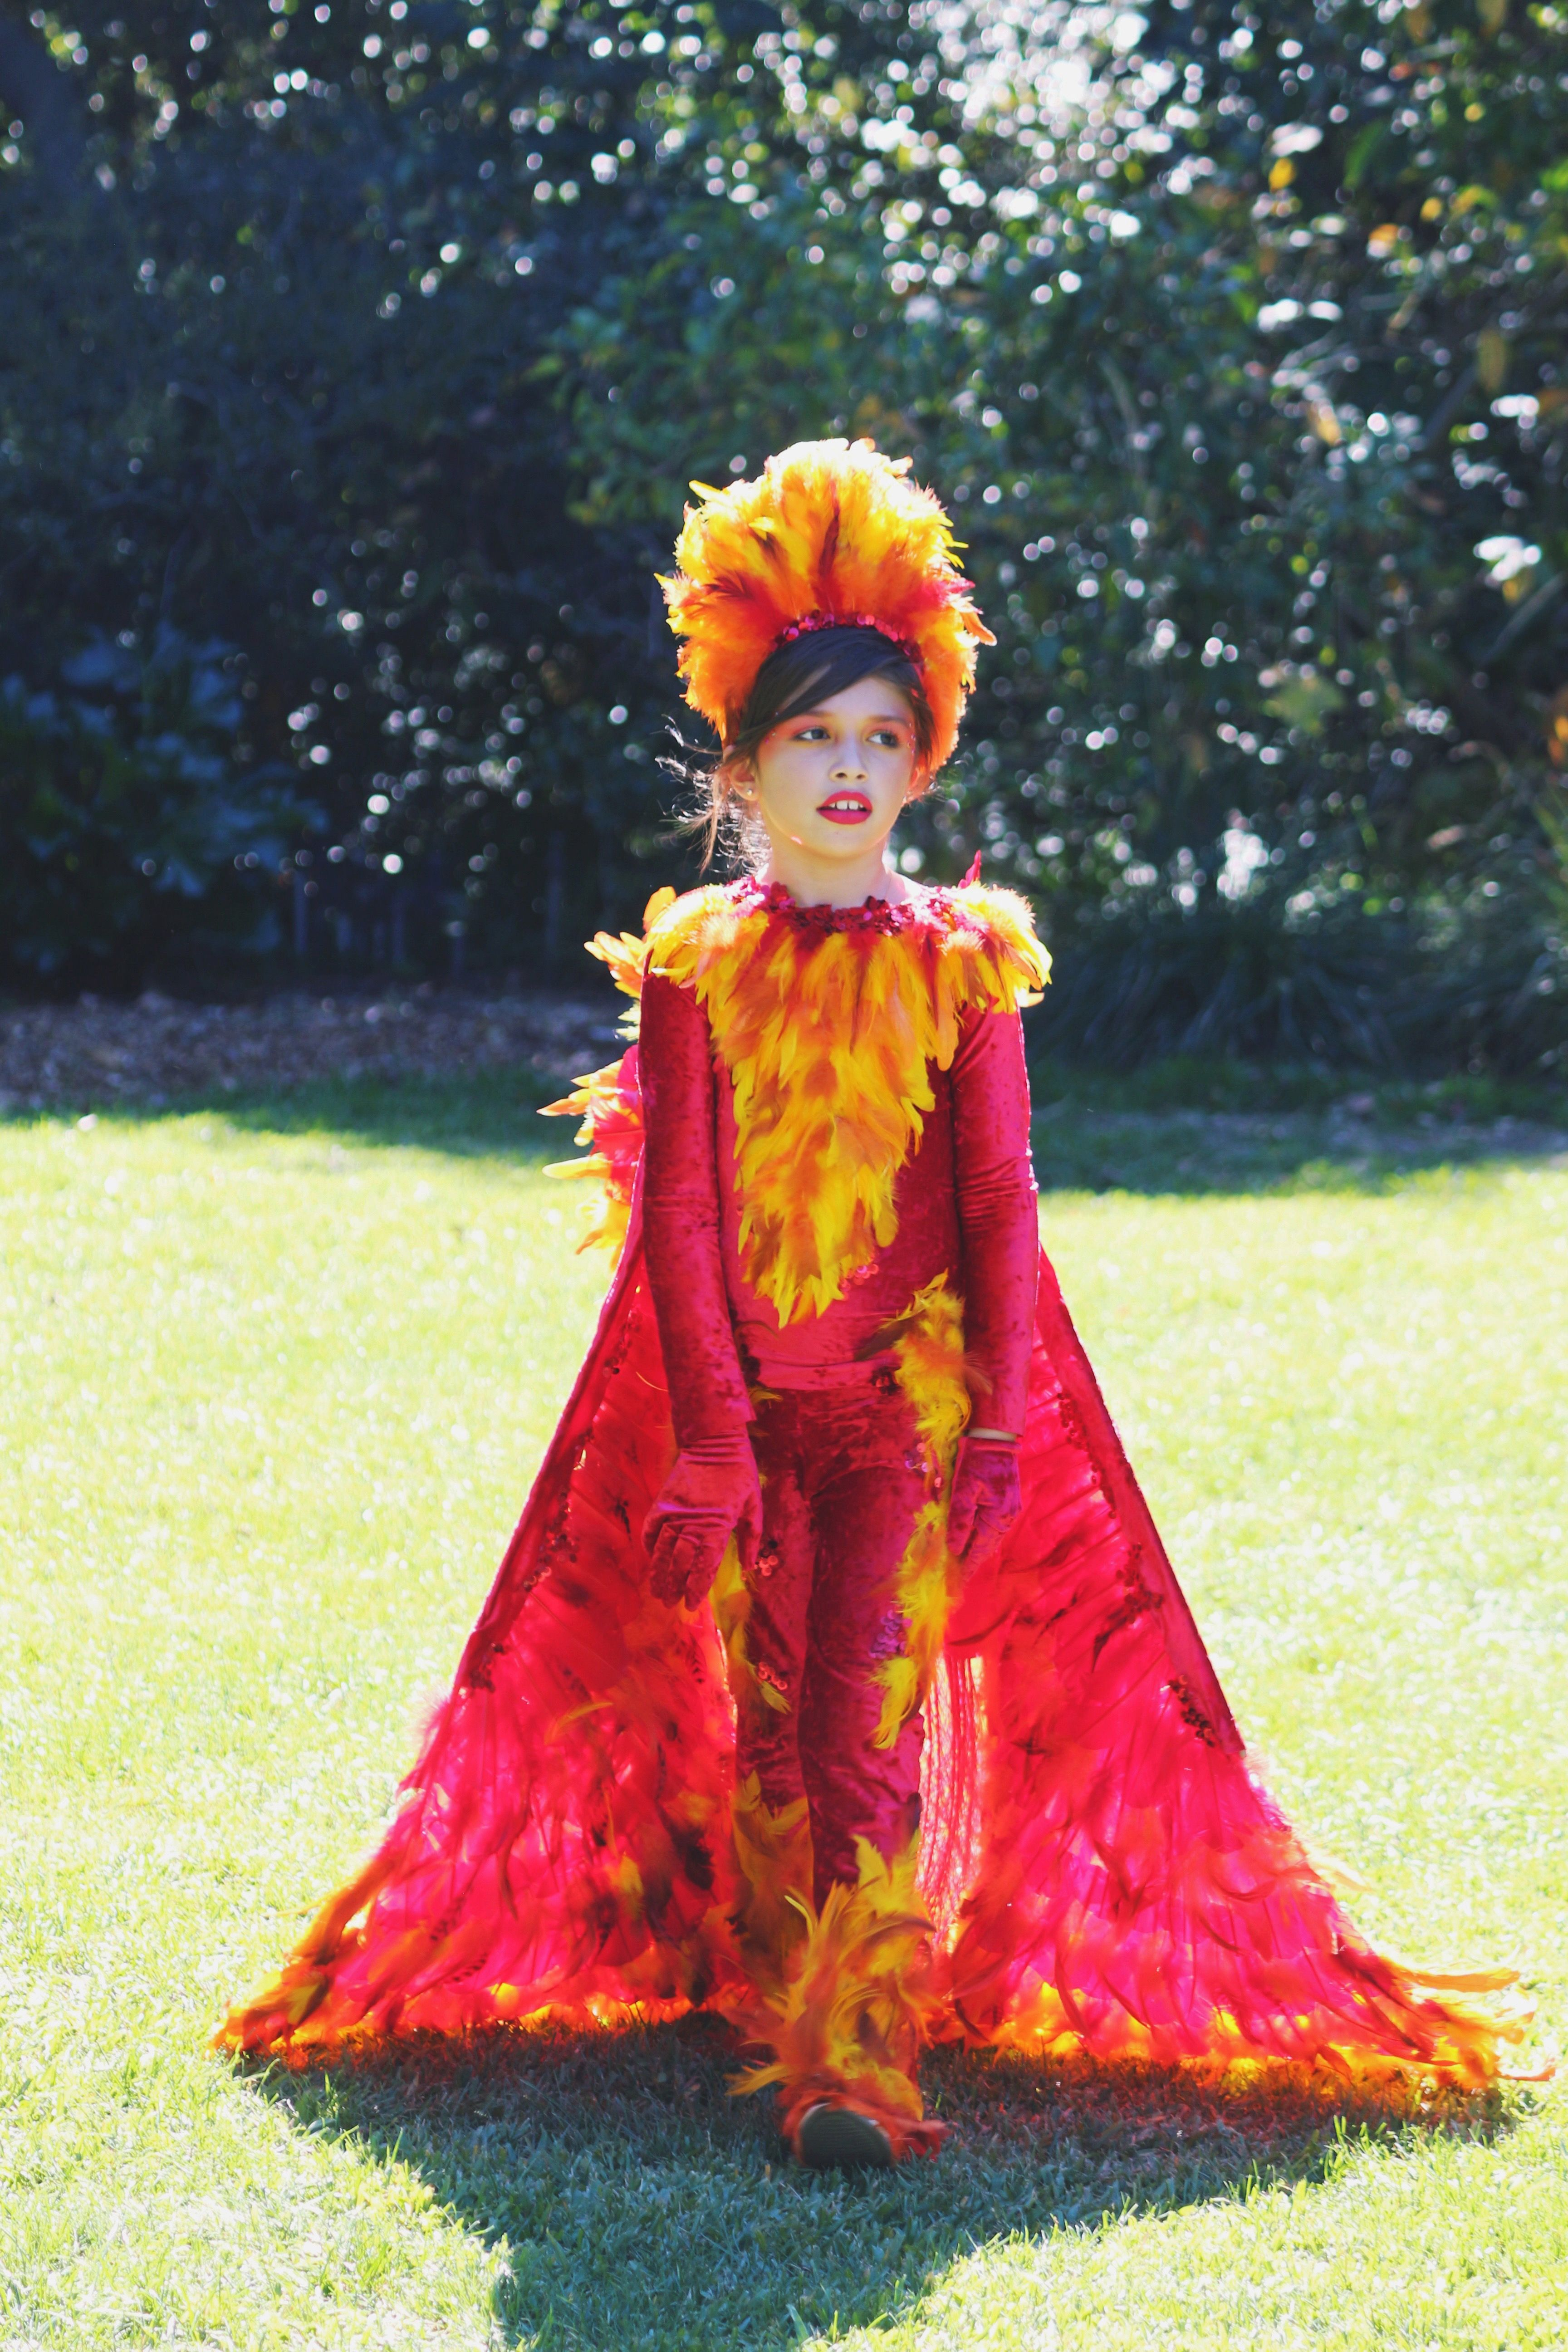 Halloween Events Pheonix 2020 Phoenix costume | Diy costumes kids, Phoenix costume, Diy costumes